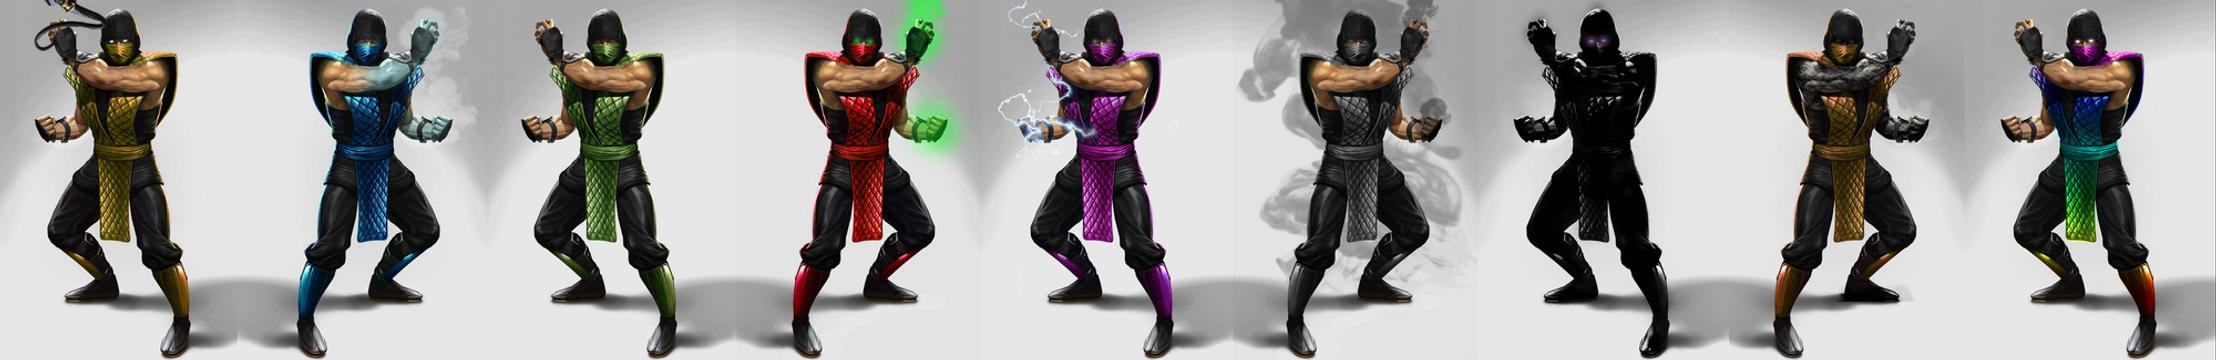 Klassic Mortal Kombat Ninjas by JustMcCollum